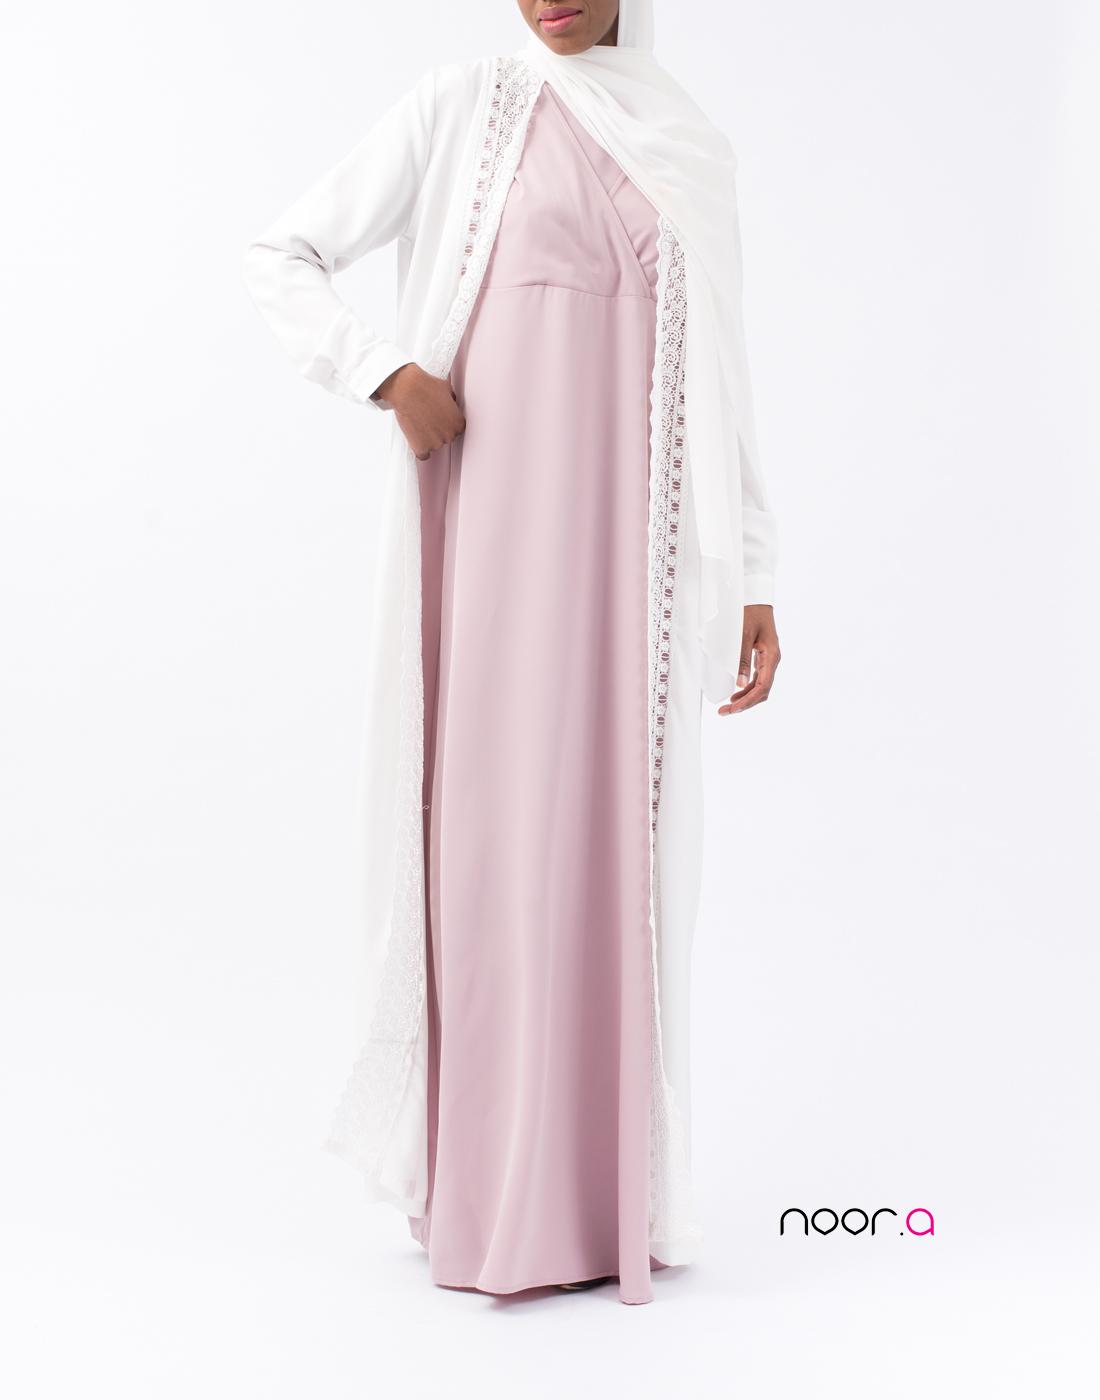 noor-a-kimono-blanc1